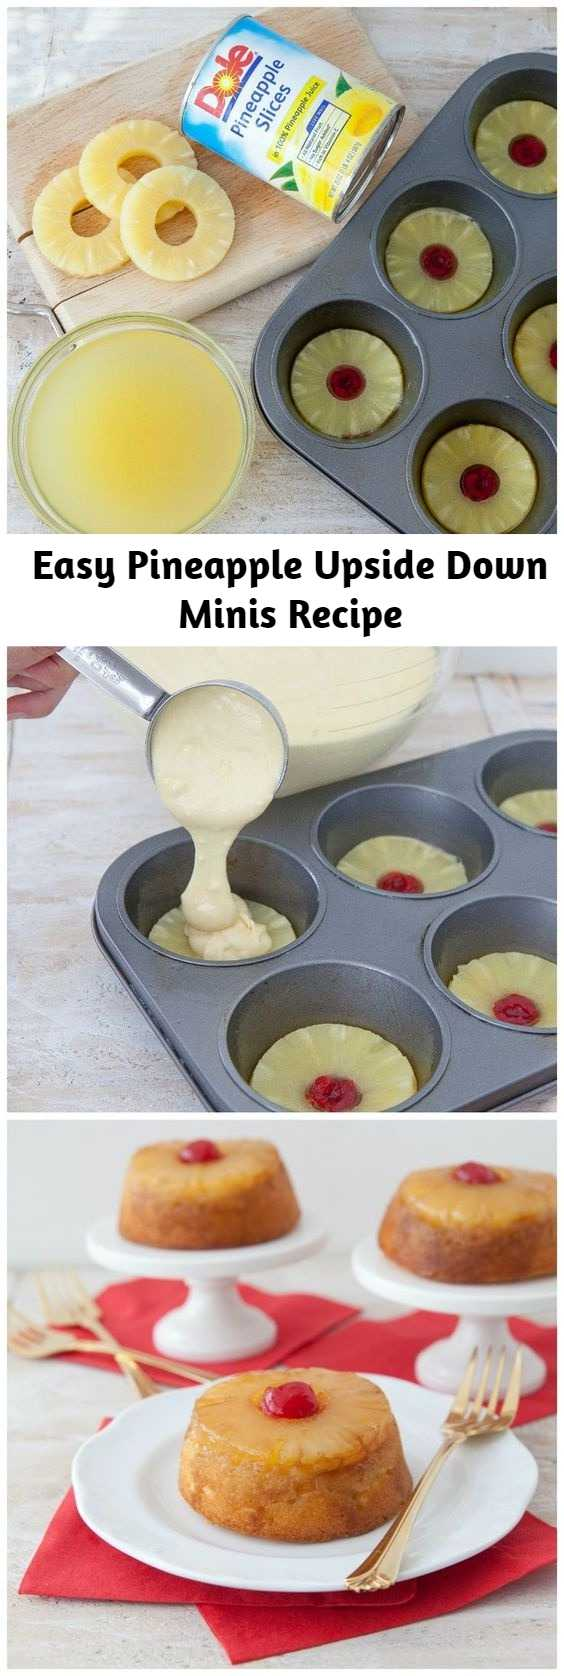 Easy Pineapple Upside Down Minis Recipe